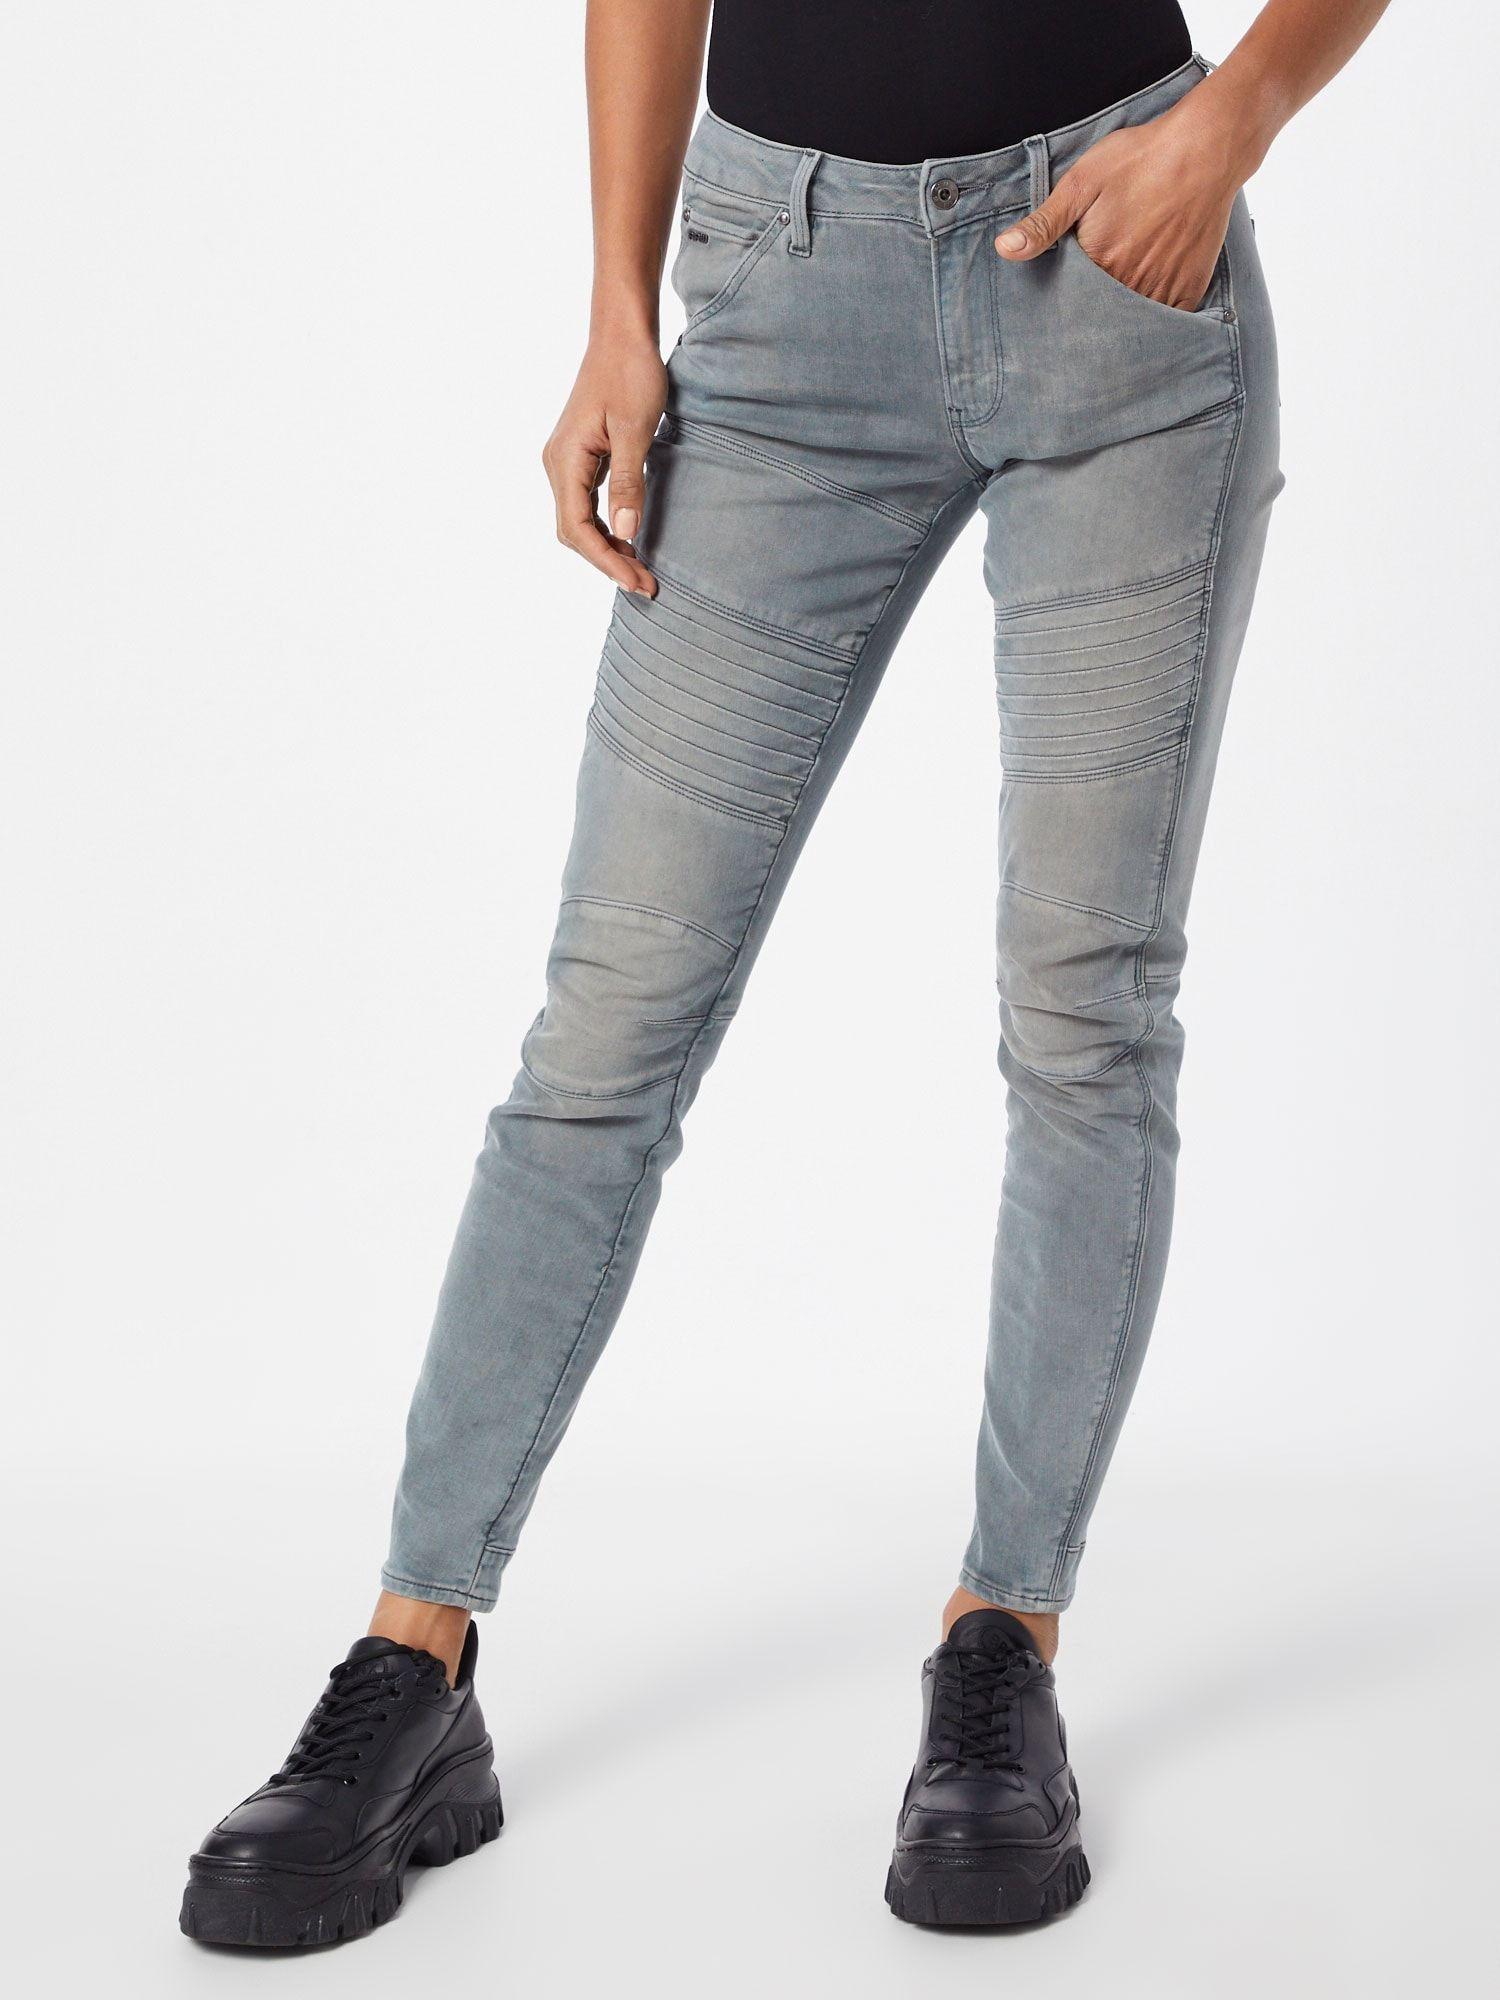 G Star Raw Jeans 5620 Custom Mid Skinny Damen Grau Grosse 31 In 2020 Custom Jeans Raw Jeans Reebok Club